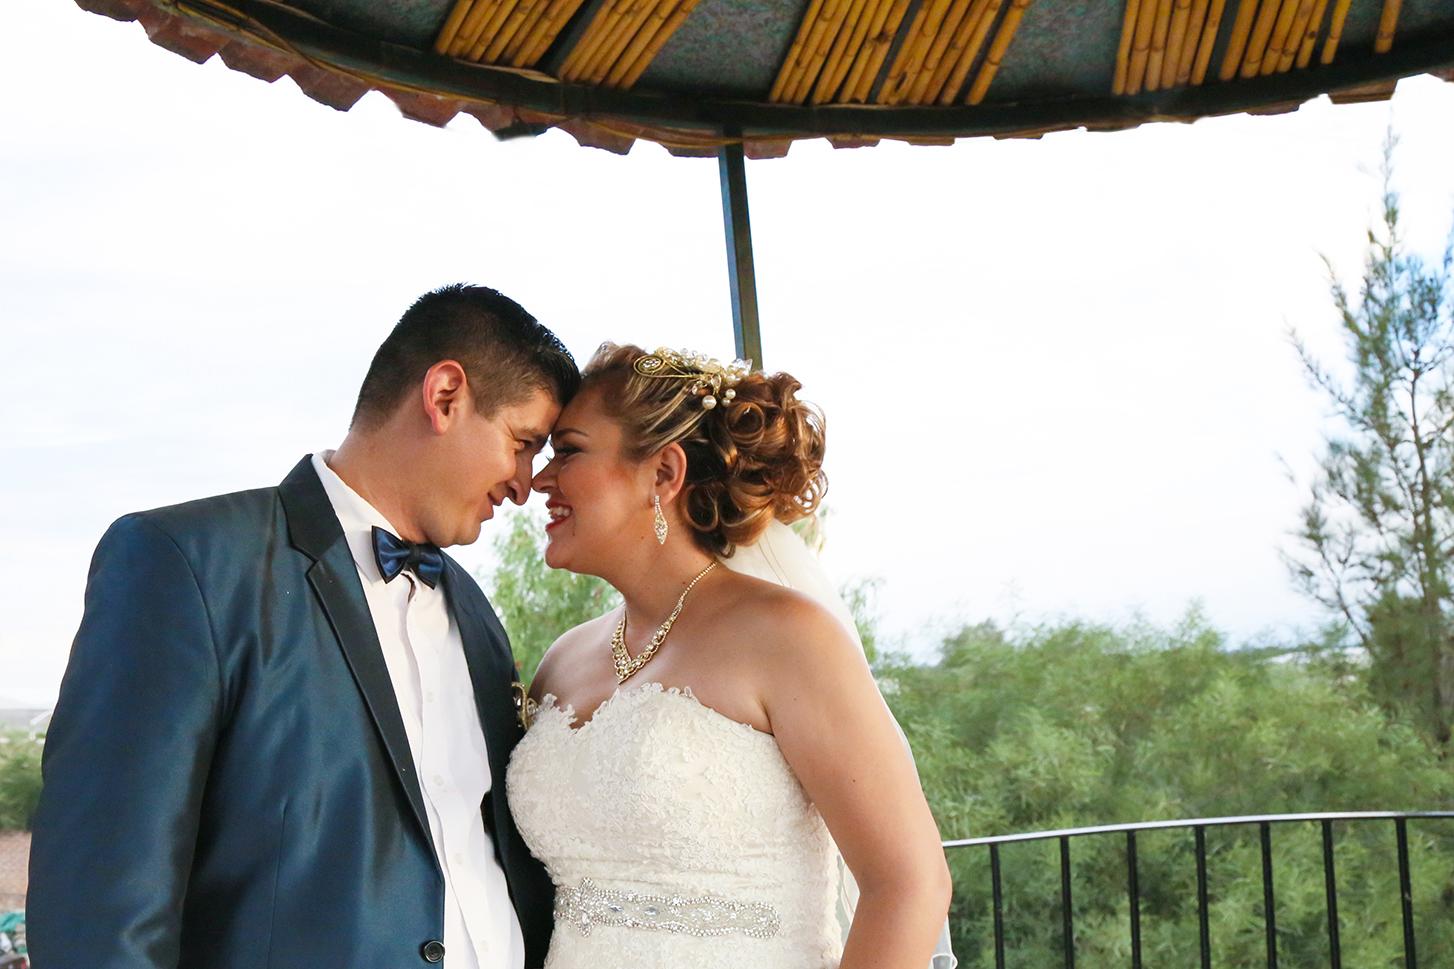 Maroge-Angela-Velazquez-fotografia-boda-36